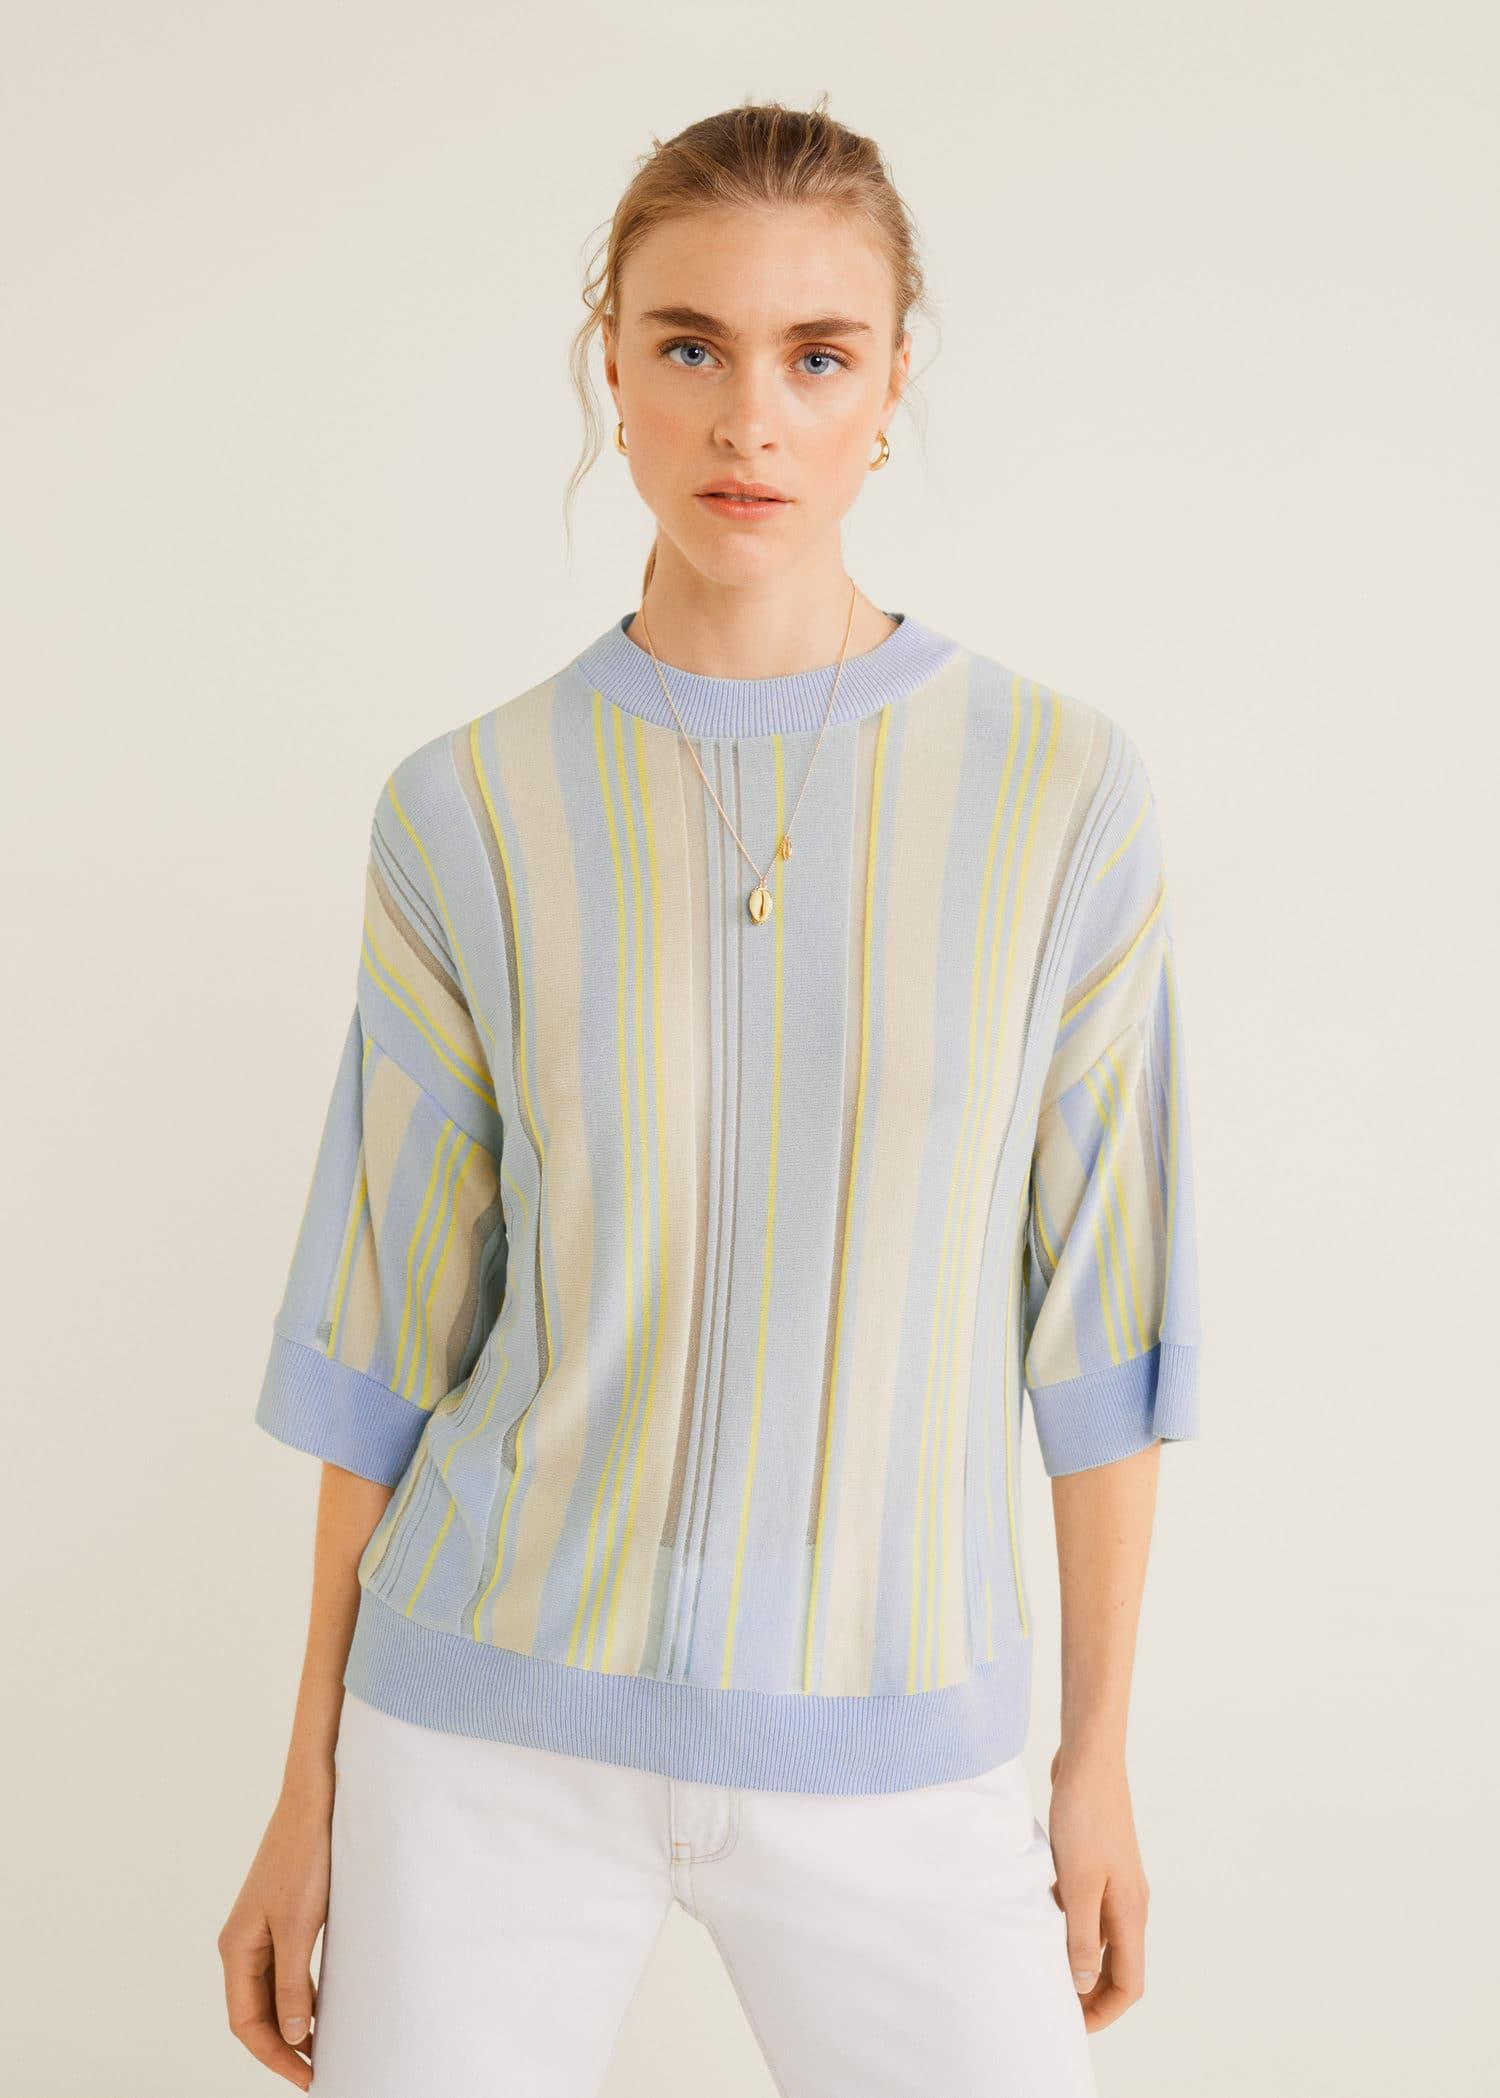 Fine knit striped sweater Woman | Mango Kosovo